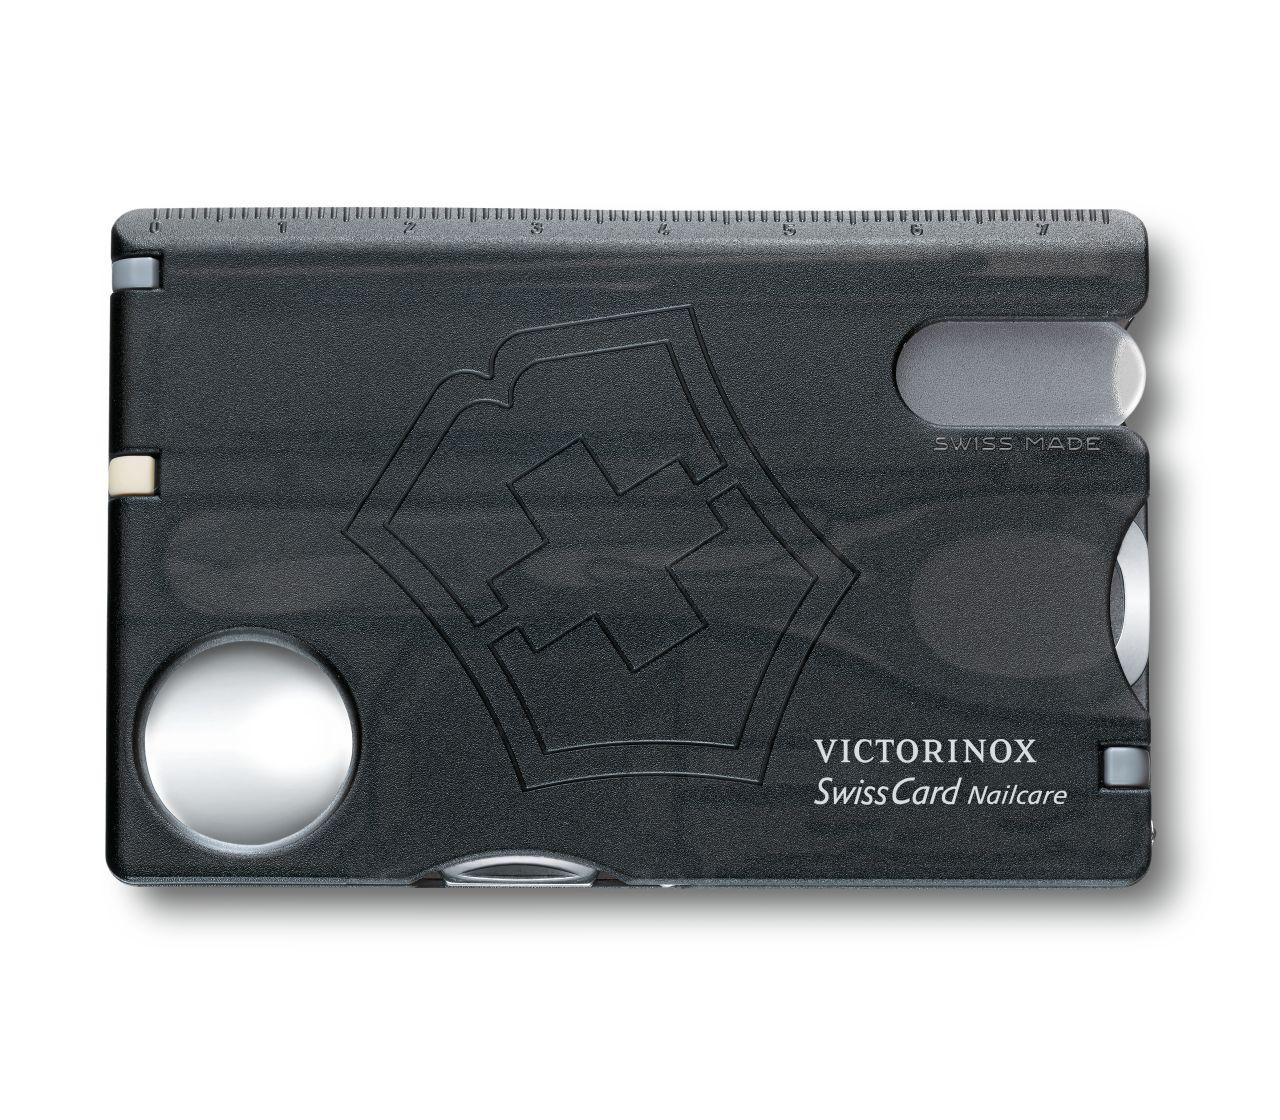 Victorinox Swisscard Nailcare Onyx